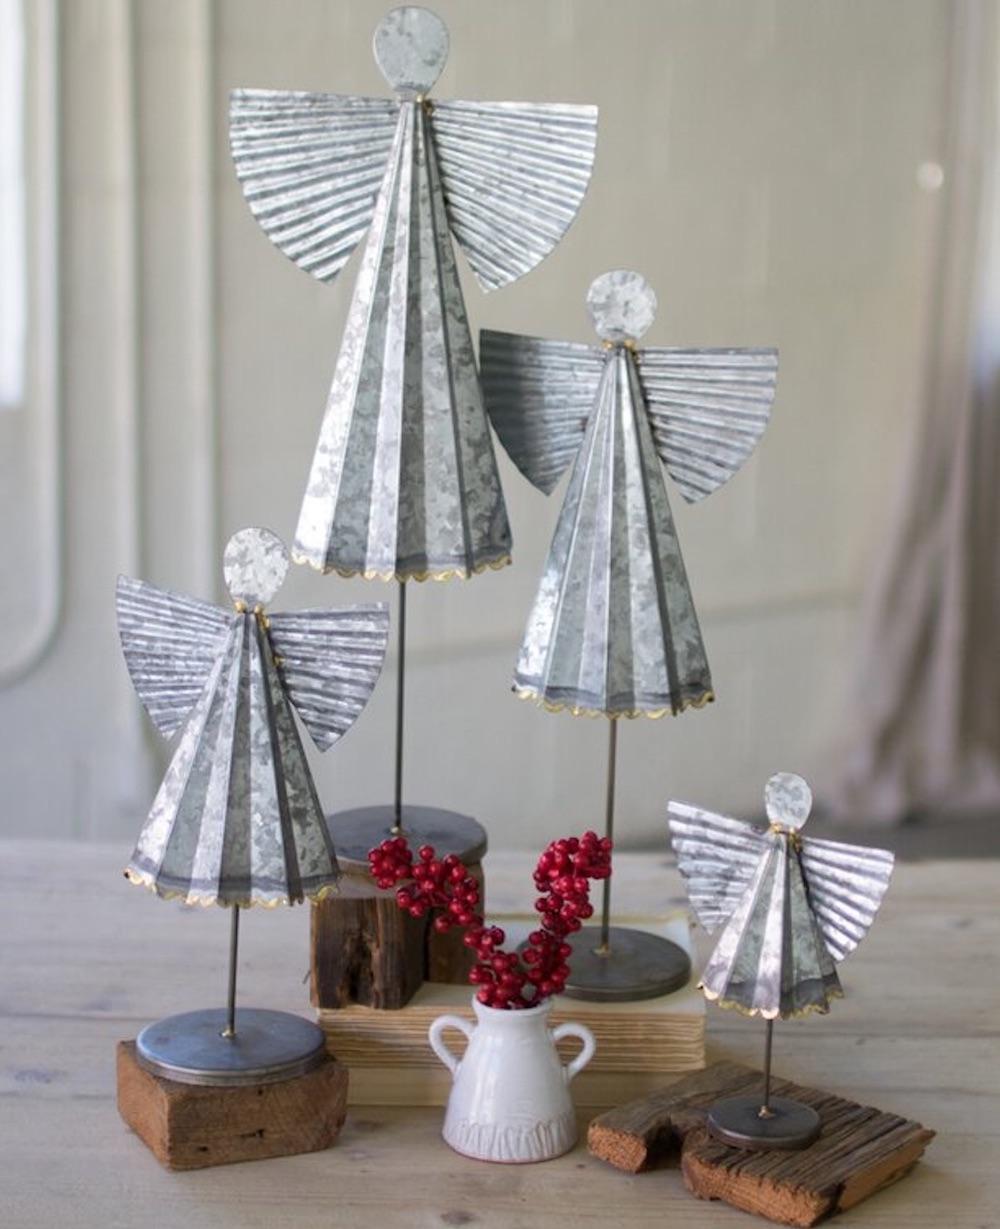 Farmhouse Christmas Decorations to Celebrate the Season Galvanized Angels #Decor #Christmas #Farmhouse #ChristmasDecor #FarmhouseDecor #FarmhouseChristmasDecor #HolidayDecor